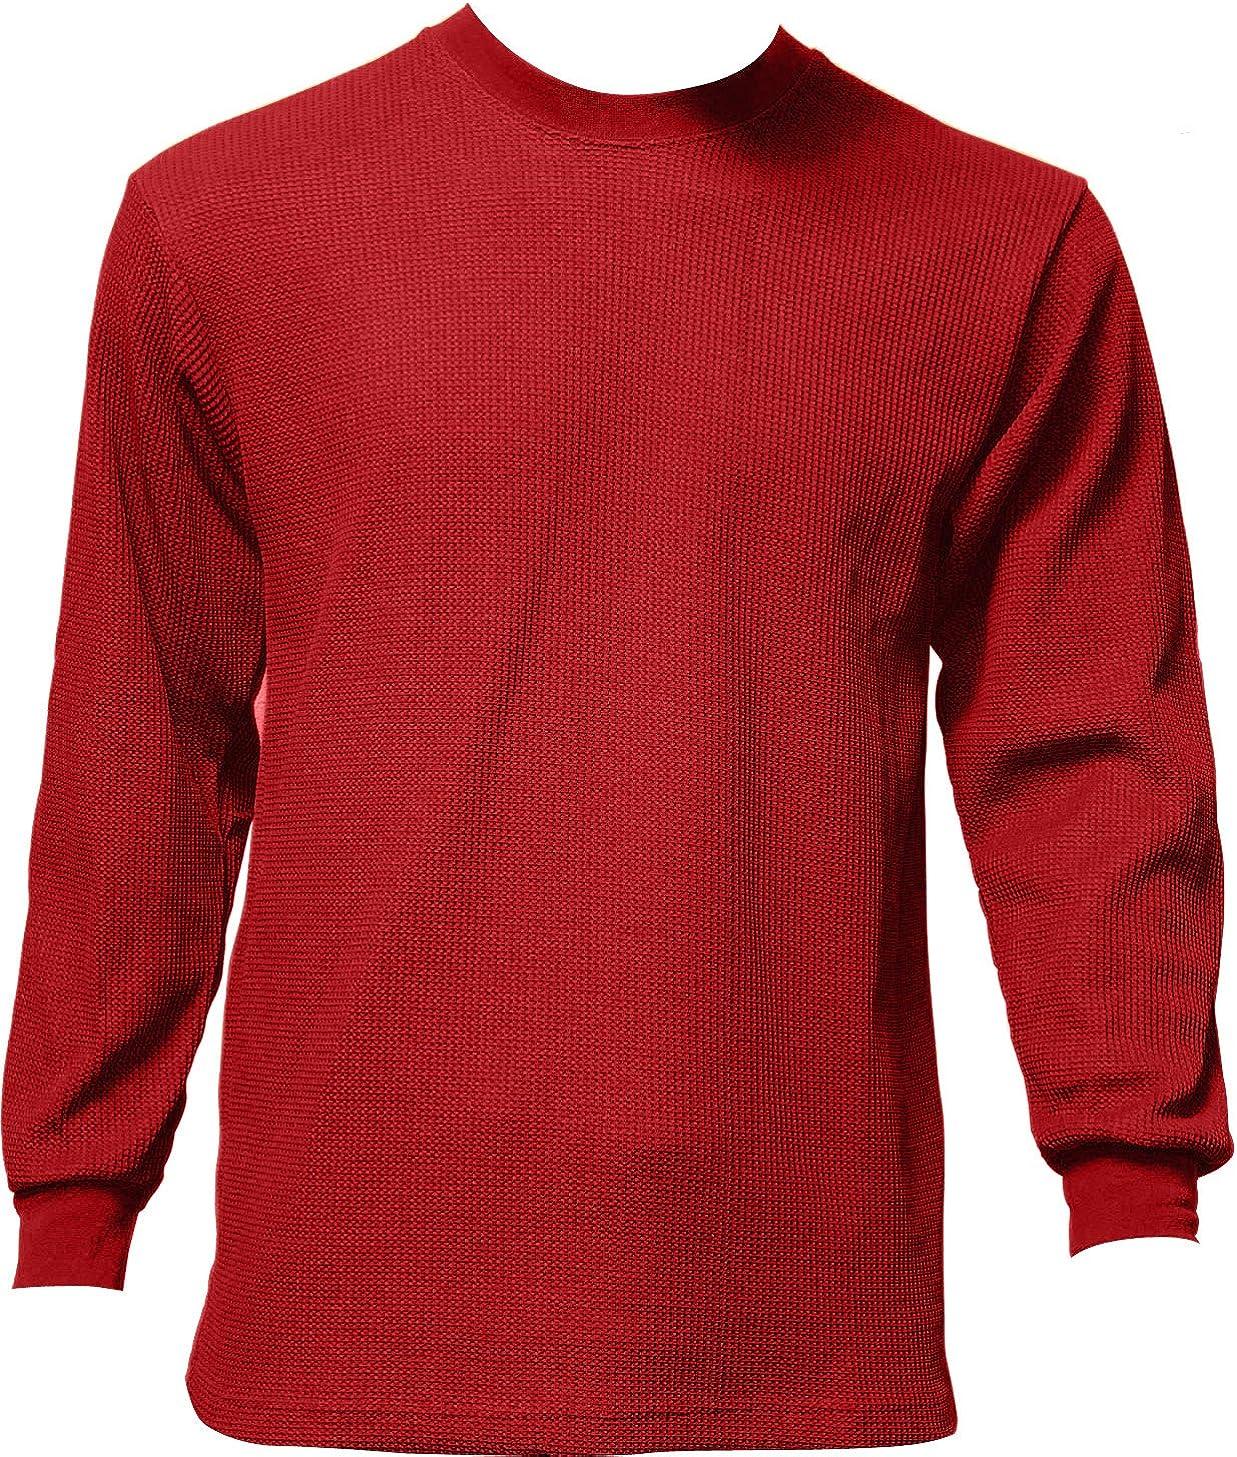 New Men/'s Noiz Long Sleeve Crew Neck Thermal Khaki Size X-Large Brand New!